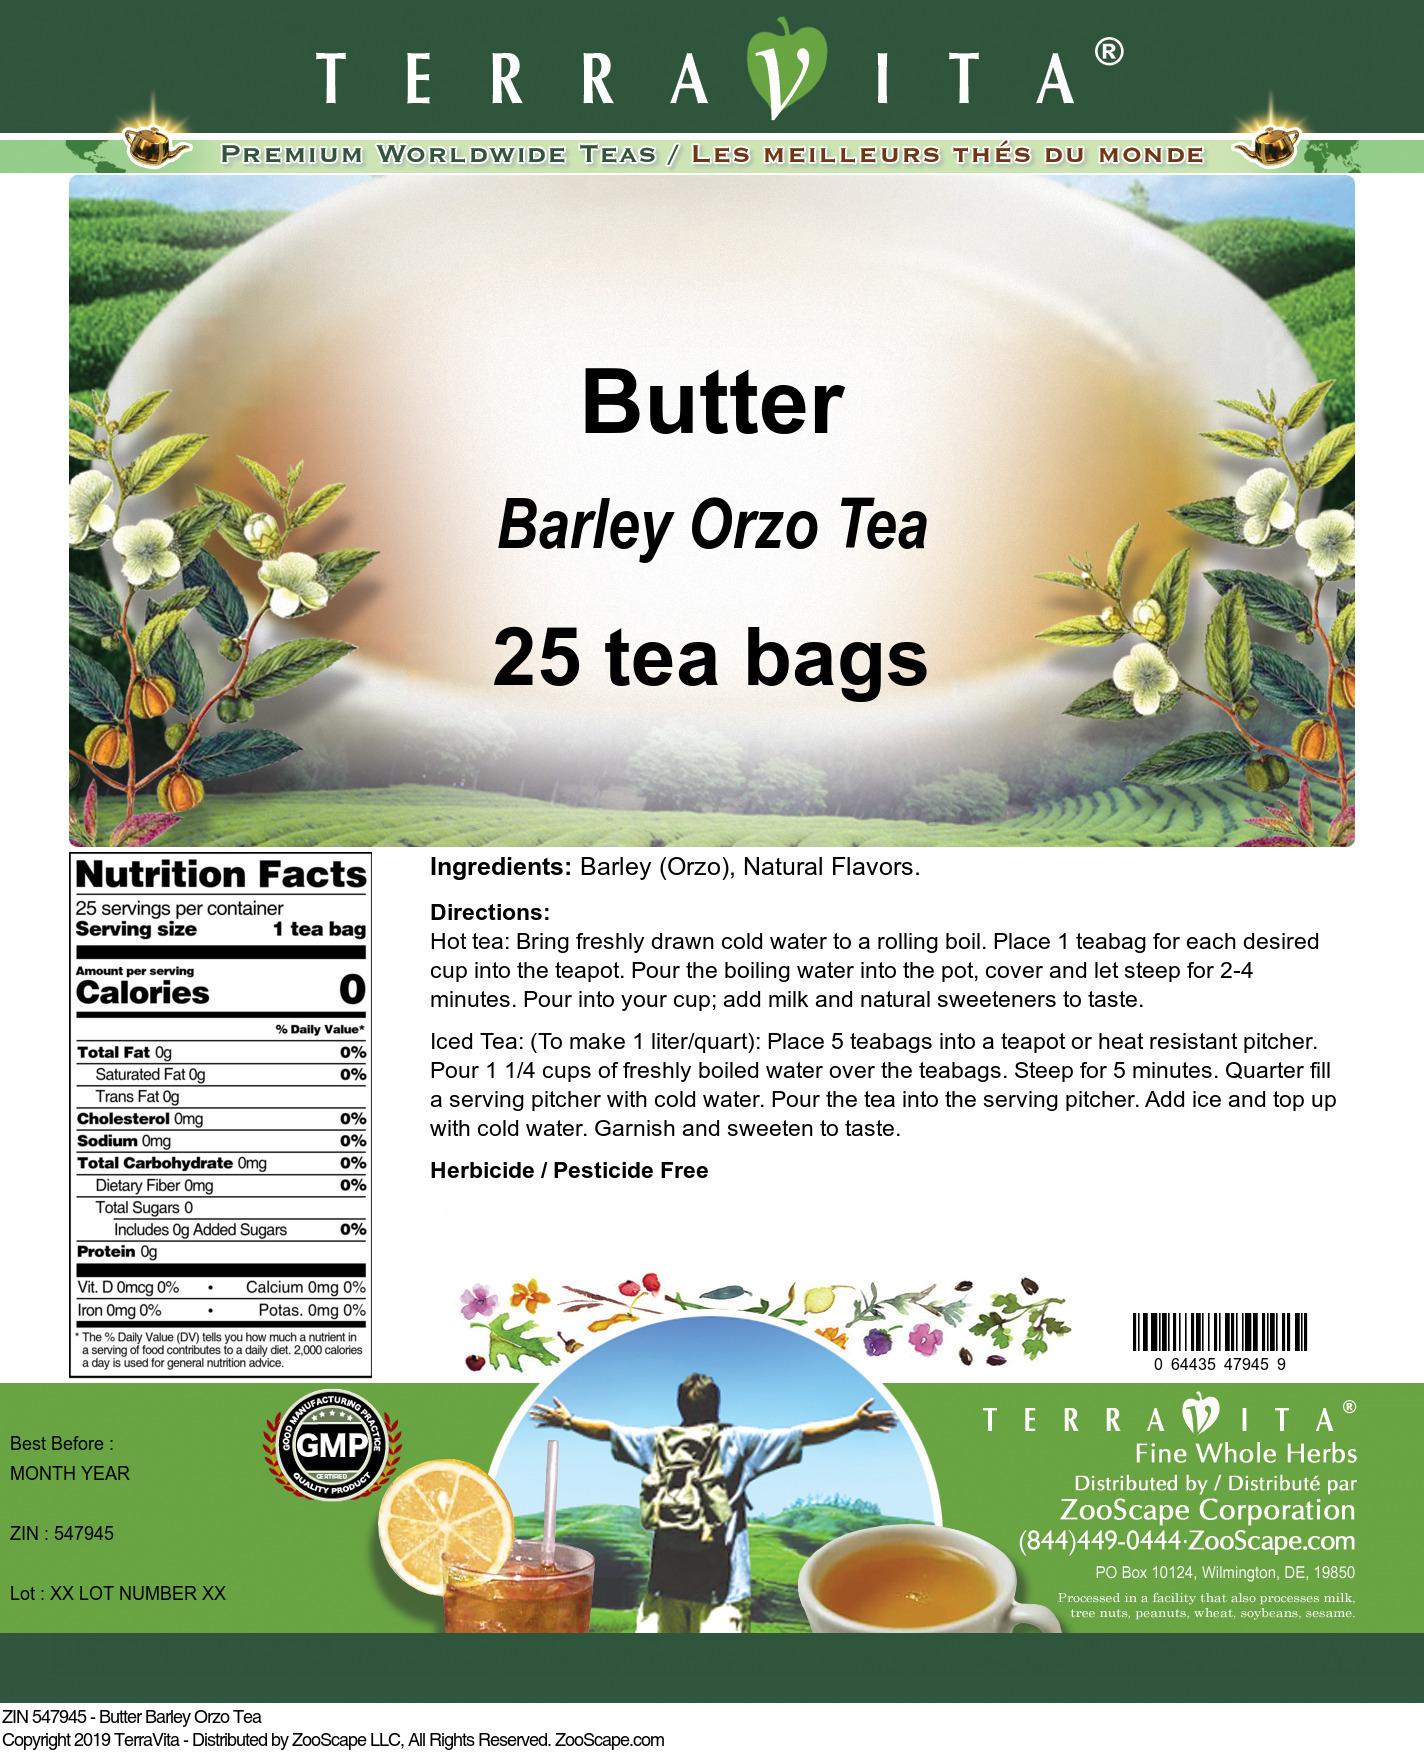 Butter Barley Orzo